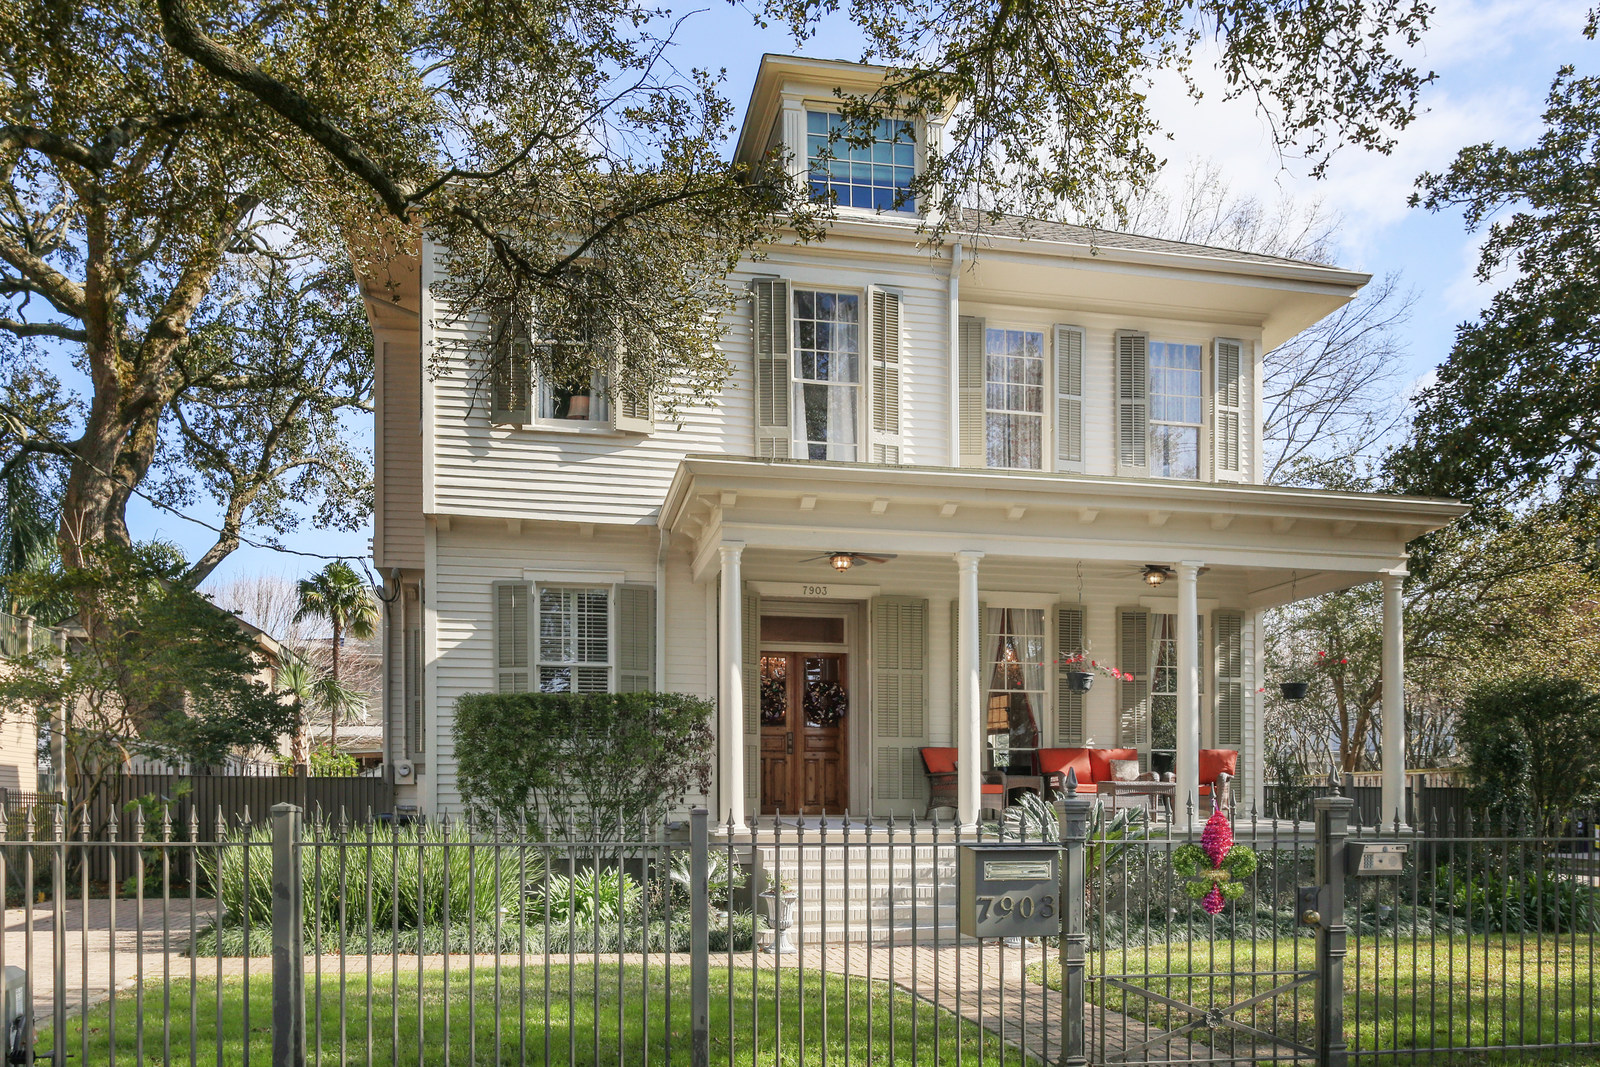 New Orleans, Louisiana 70118